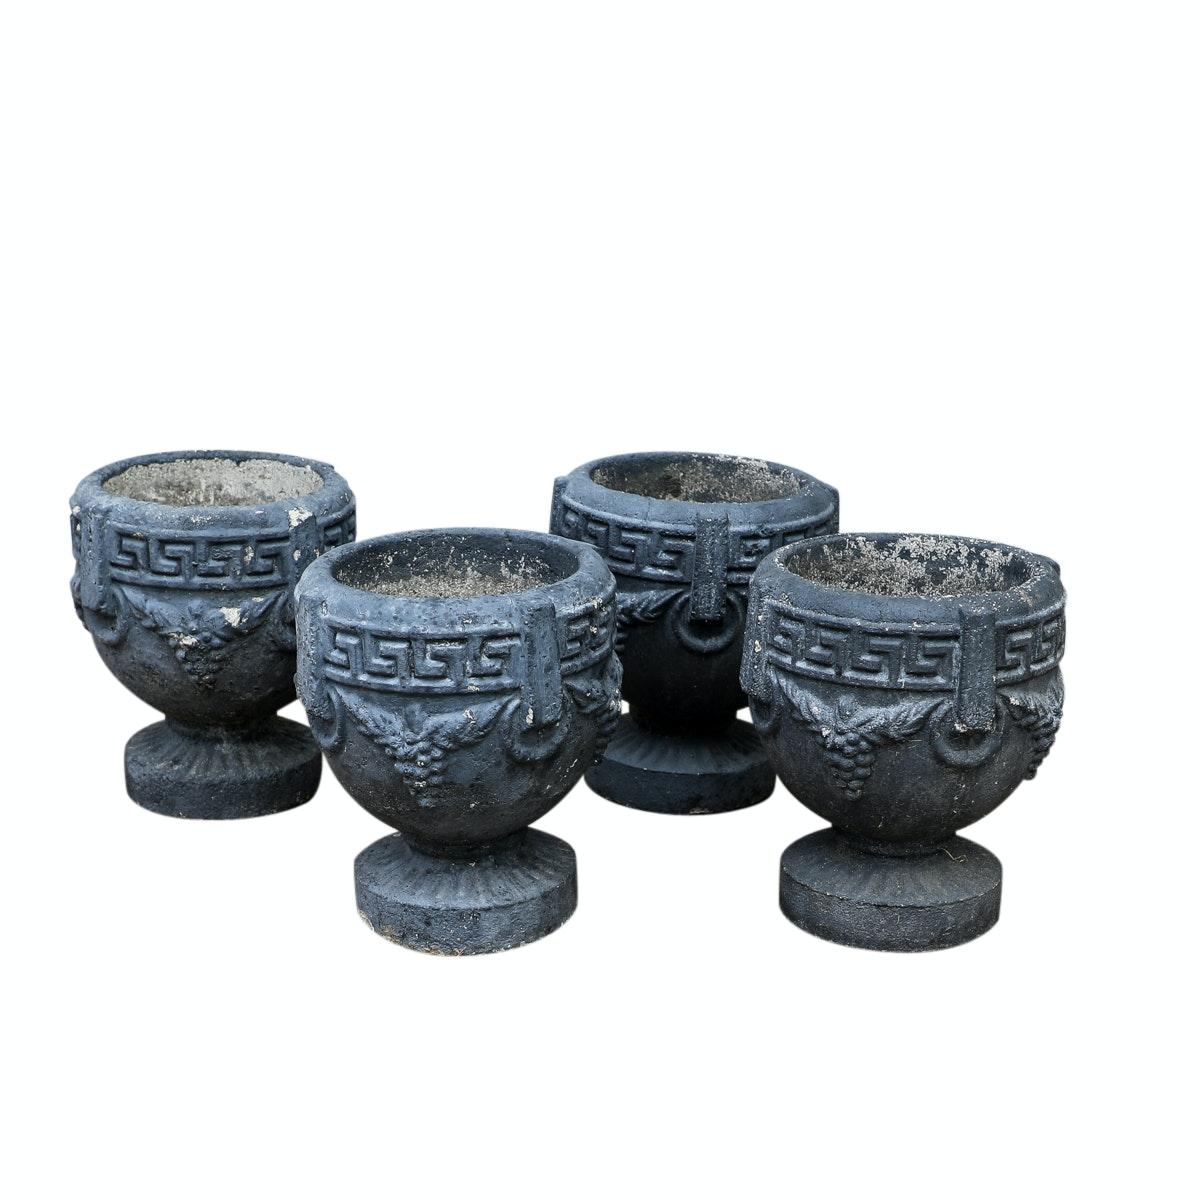 Neoclassical Style Cast Stoneware Garden Planters